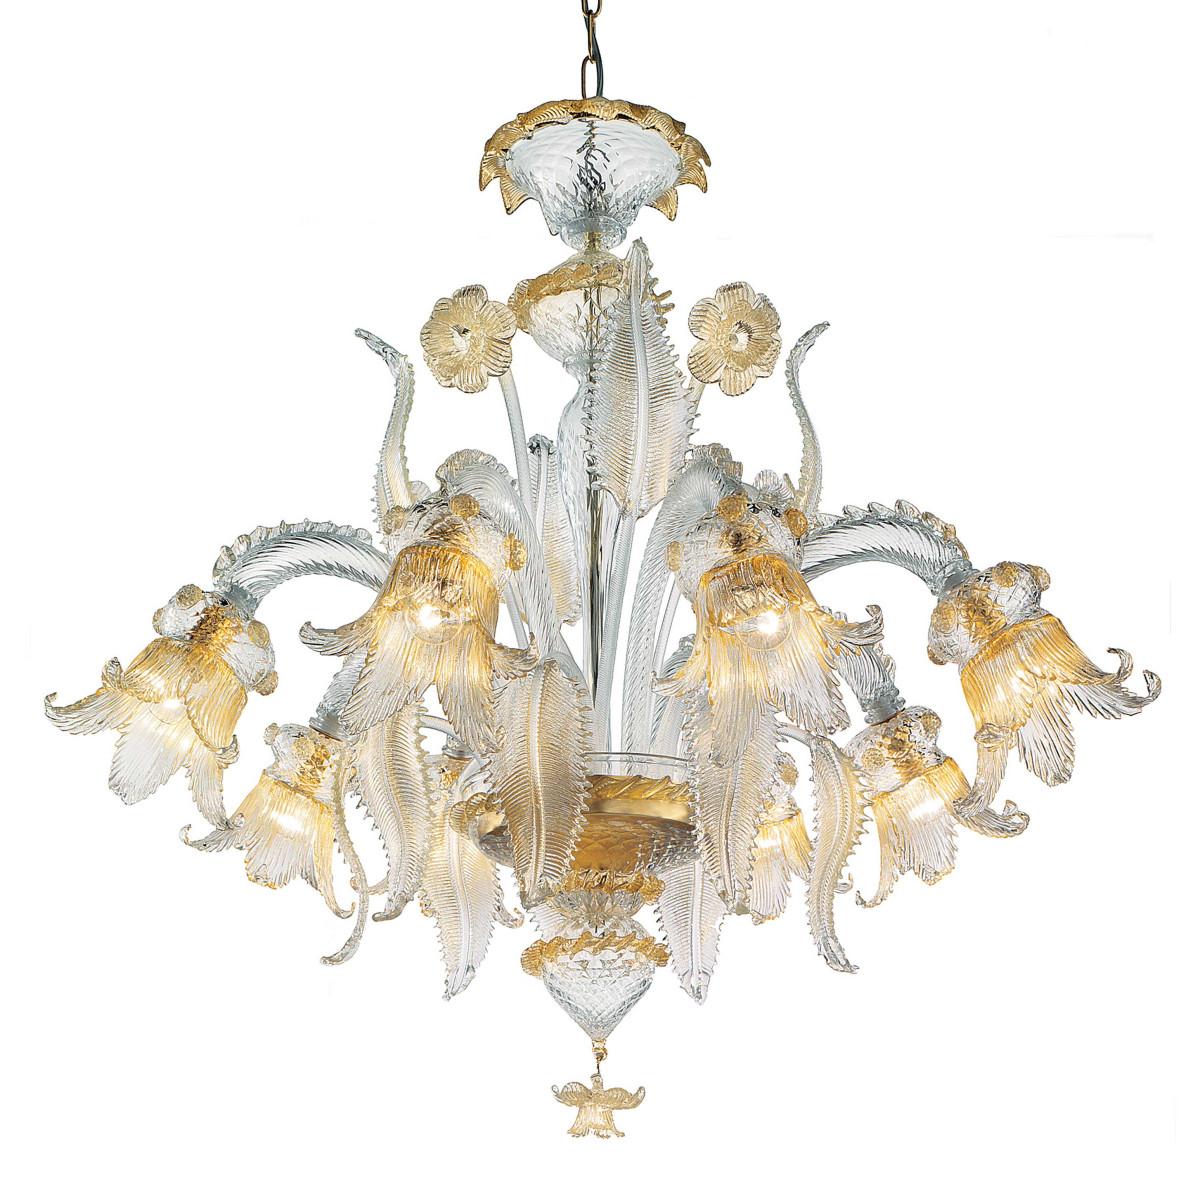 Fenice 6 lights Murano chandelier - transparent gold color